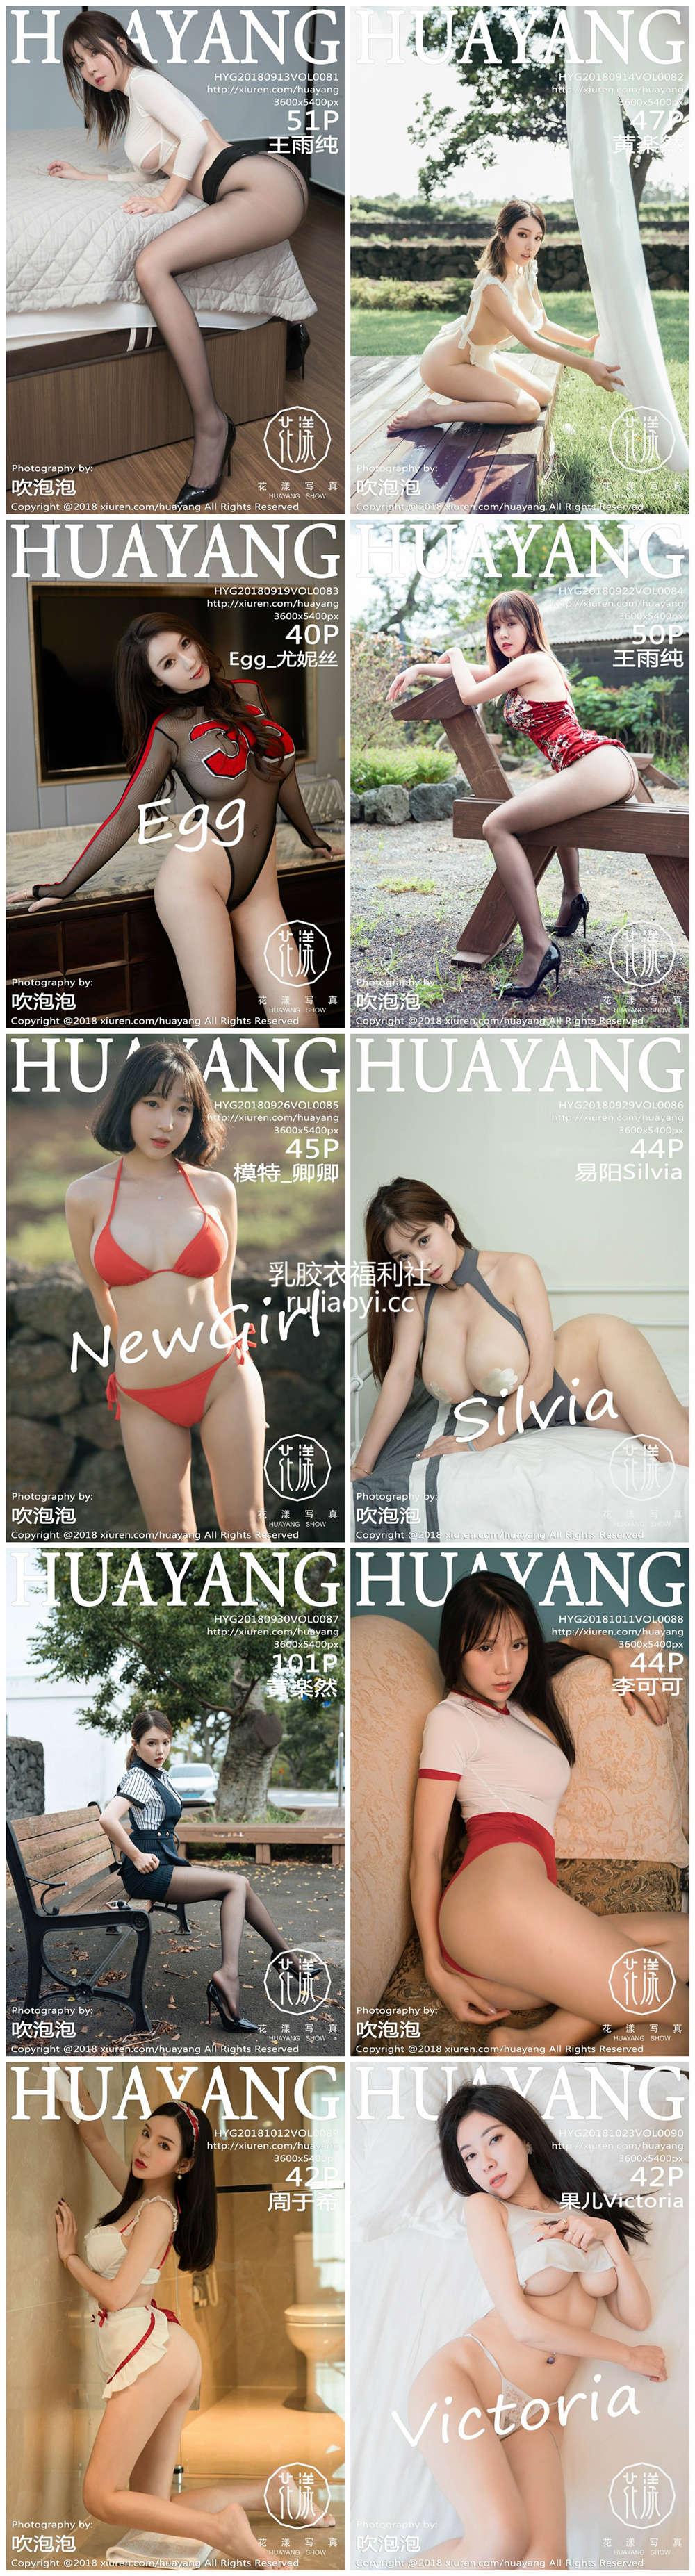 [HuaYang花漾] Vol.081-090 秀人系列 10期性感写真百度云合集下载